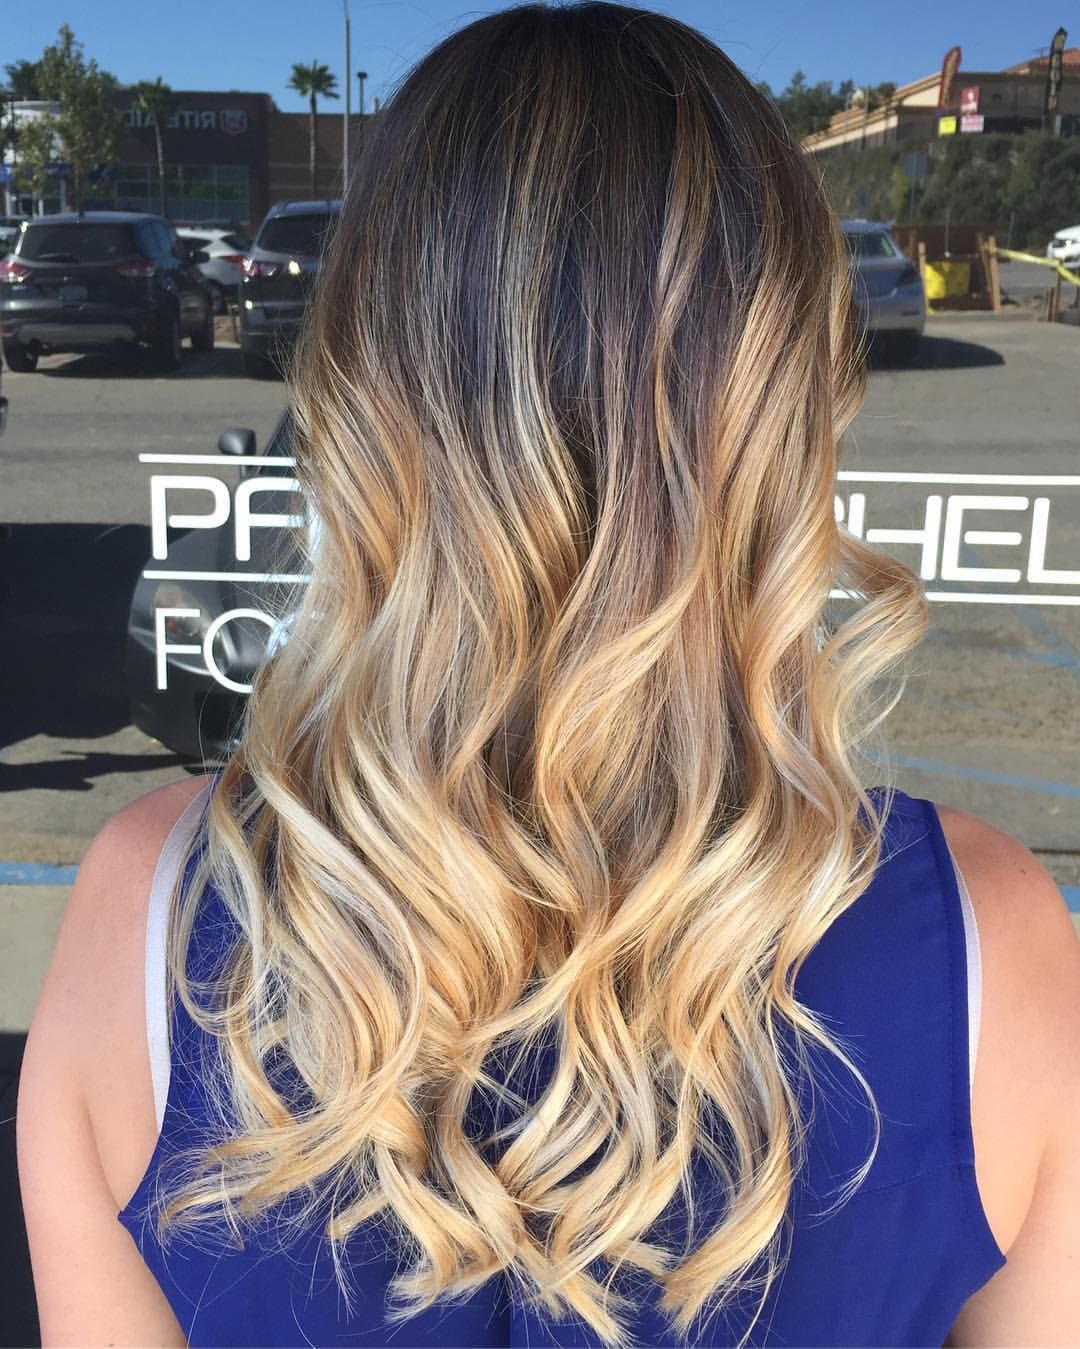 #balayage #paulmitchell #blondehair